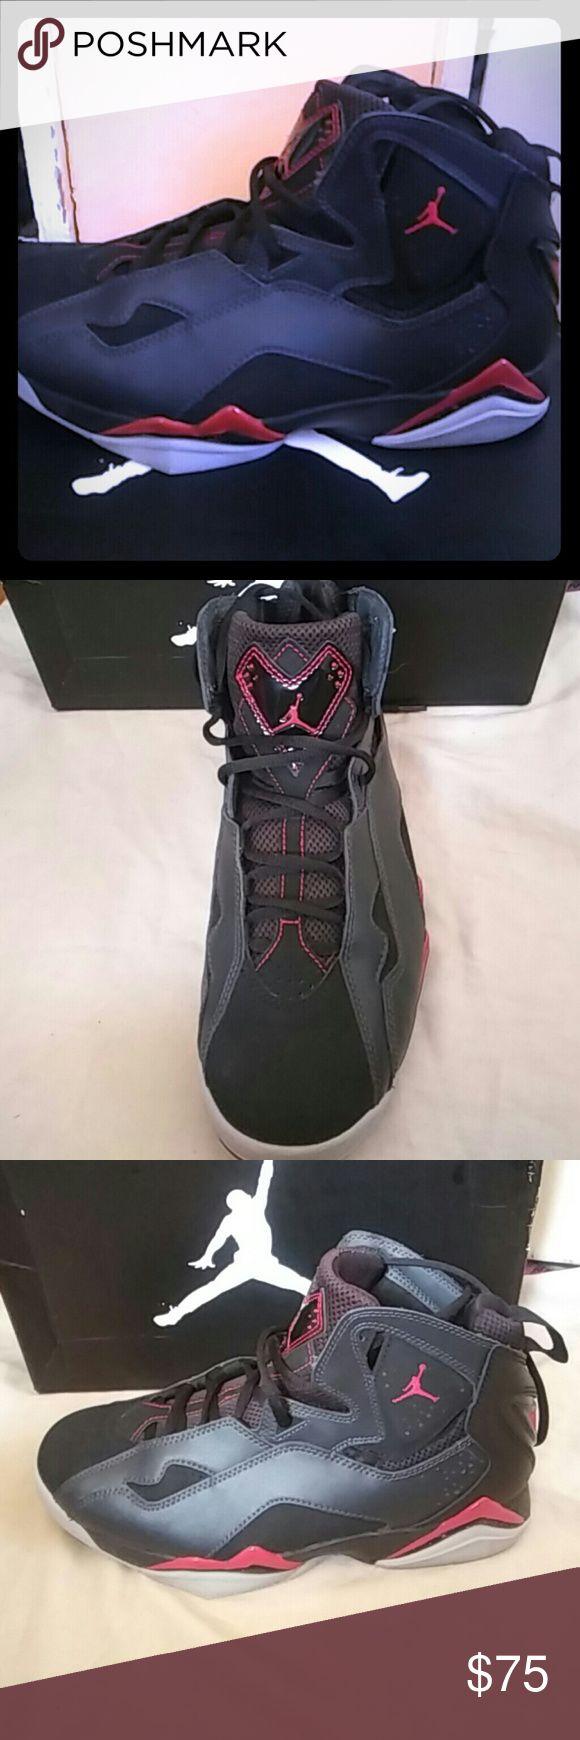 Jordan true flight red and black Red and black pair of Jordan True Flight shoes mens size 9 lightly used worn twice Jordan Shoes